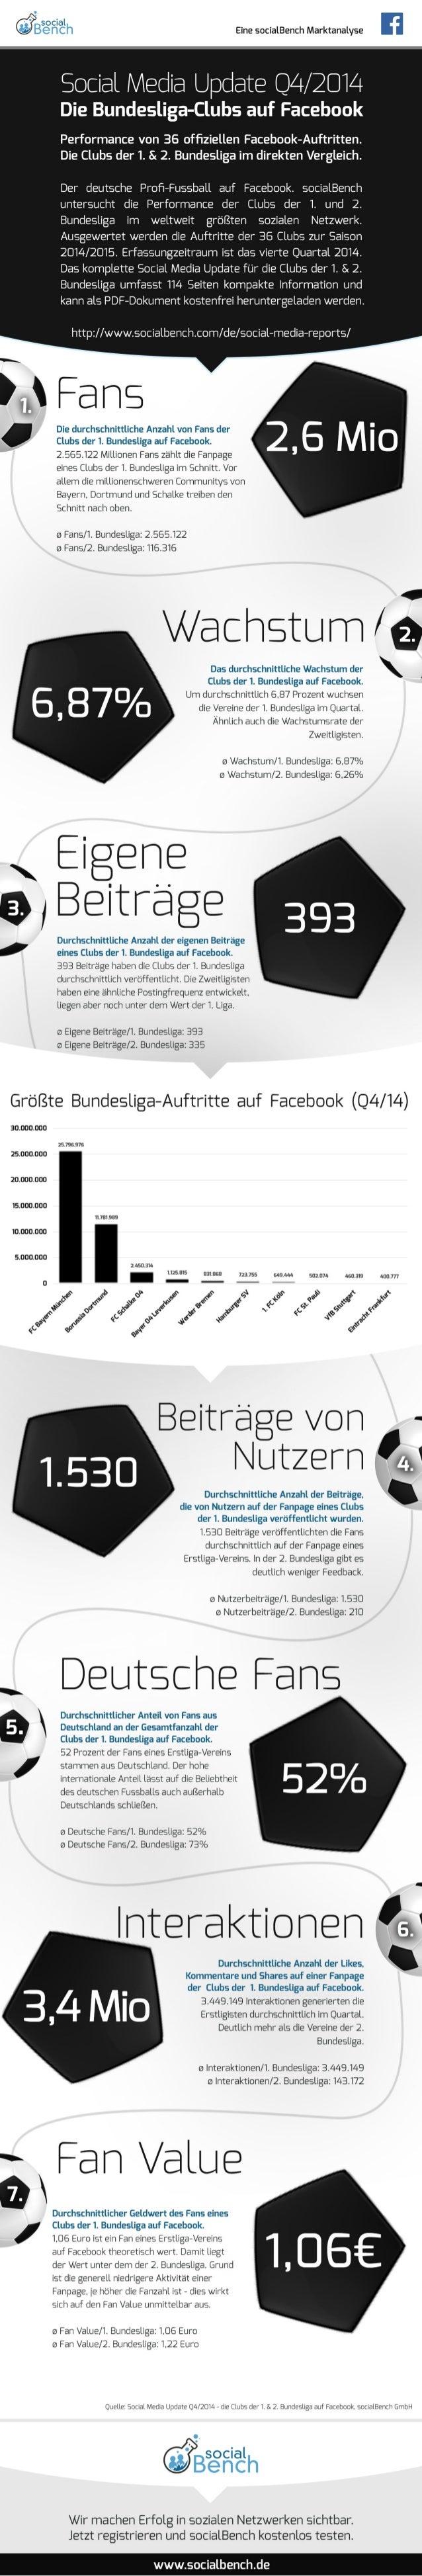 Infografik: Social Media Update Q4/2014 - die Clubs der 1. & 2. Bundesliga auf Facebook